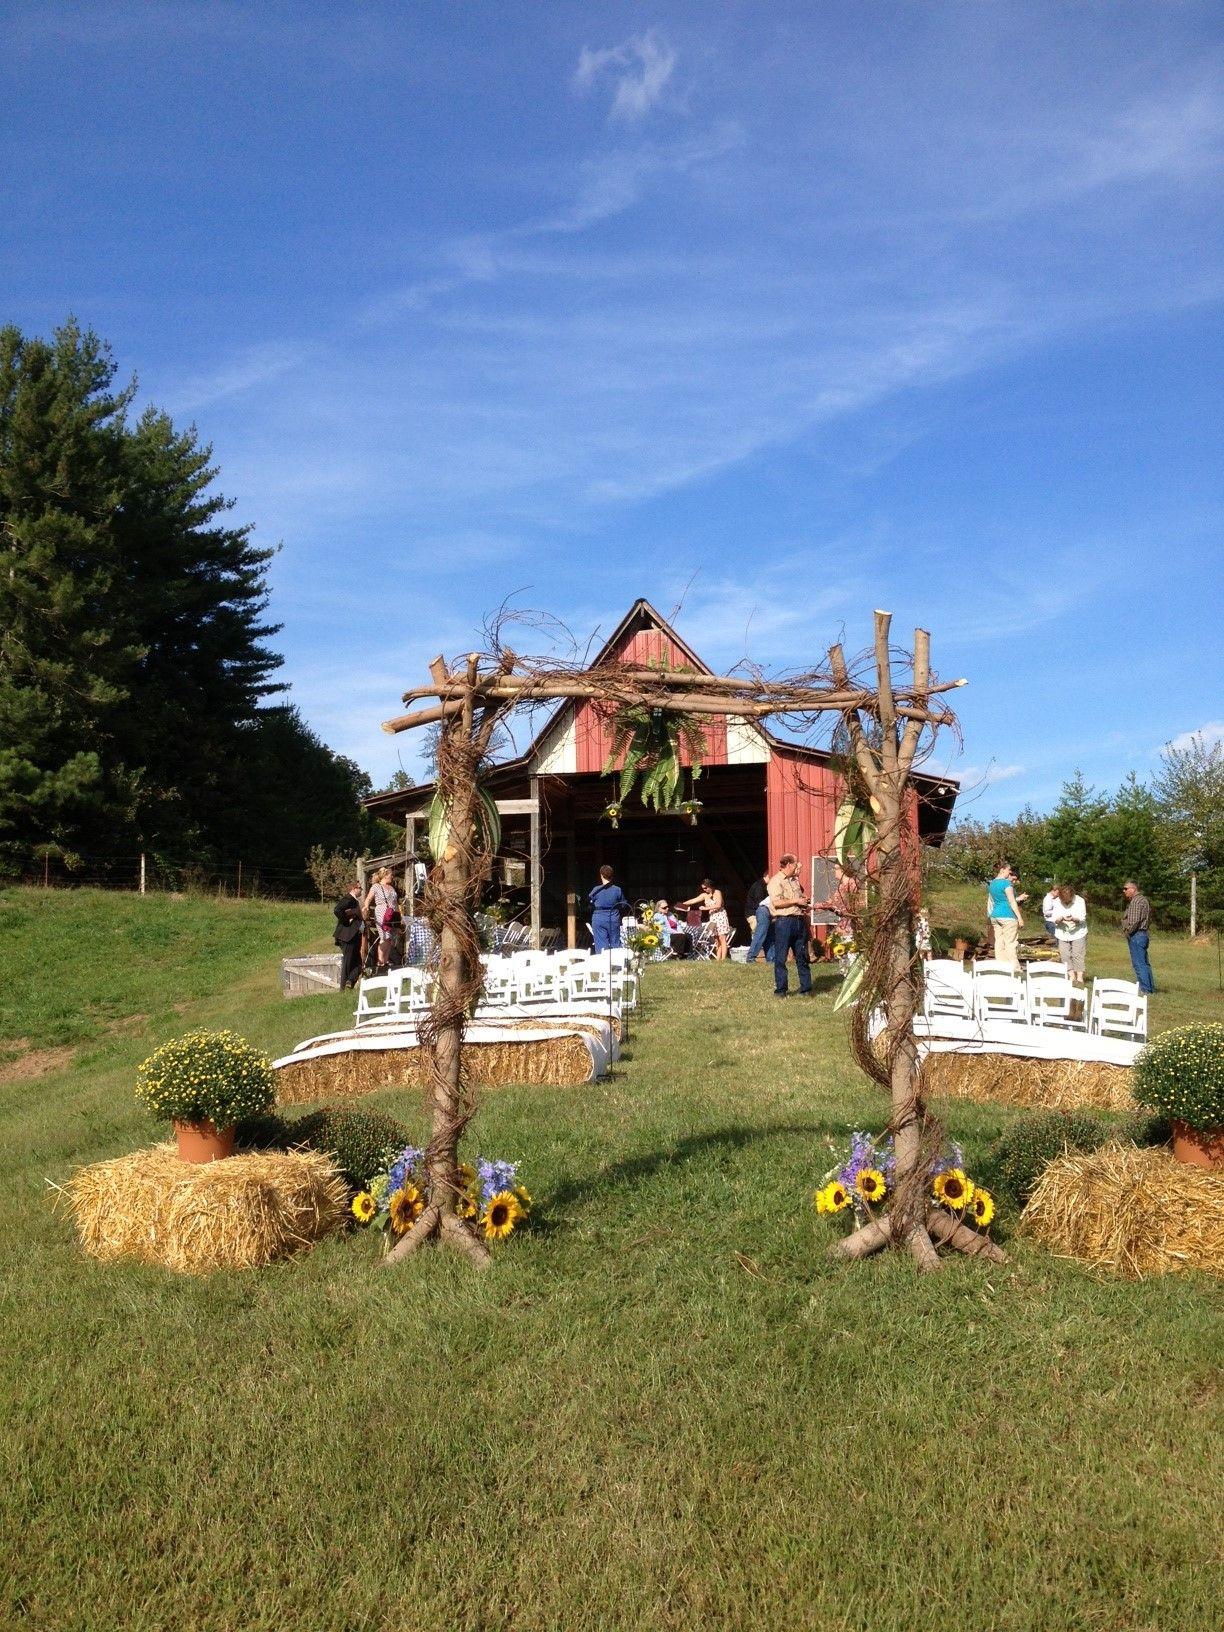 The Orchard Barn in Ellijay GA can host your dream barn